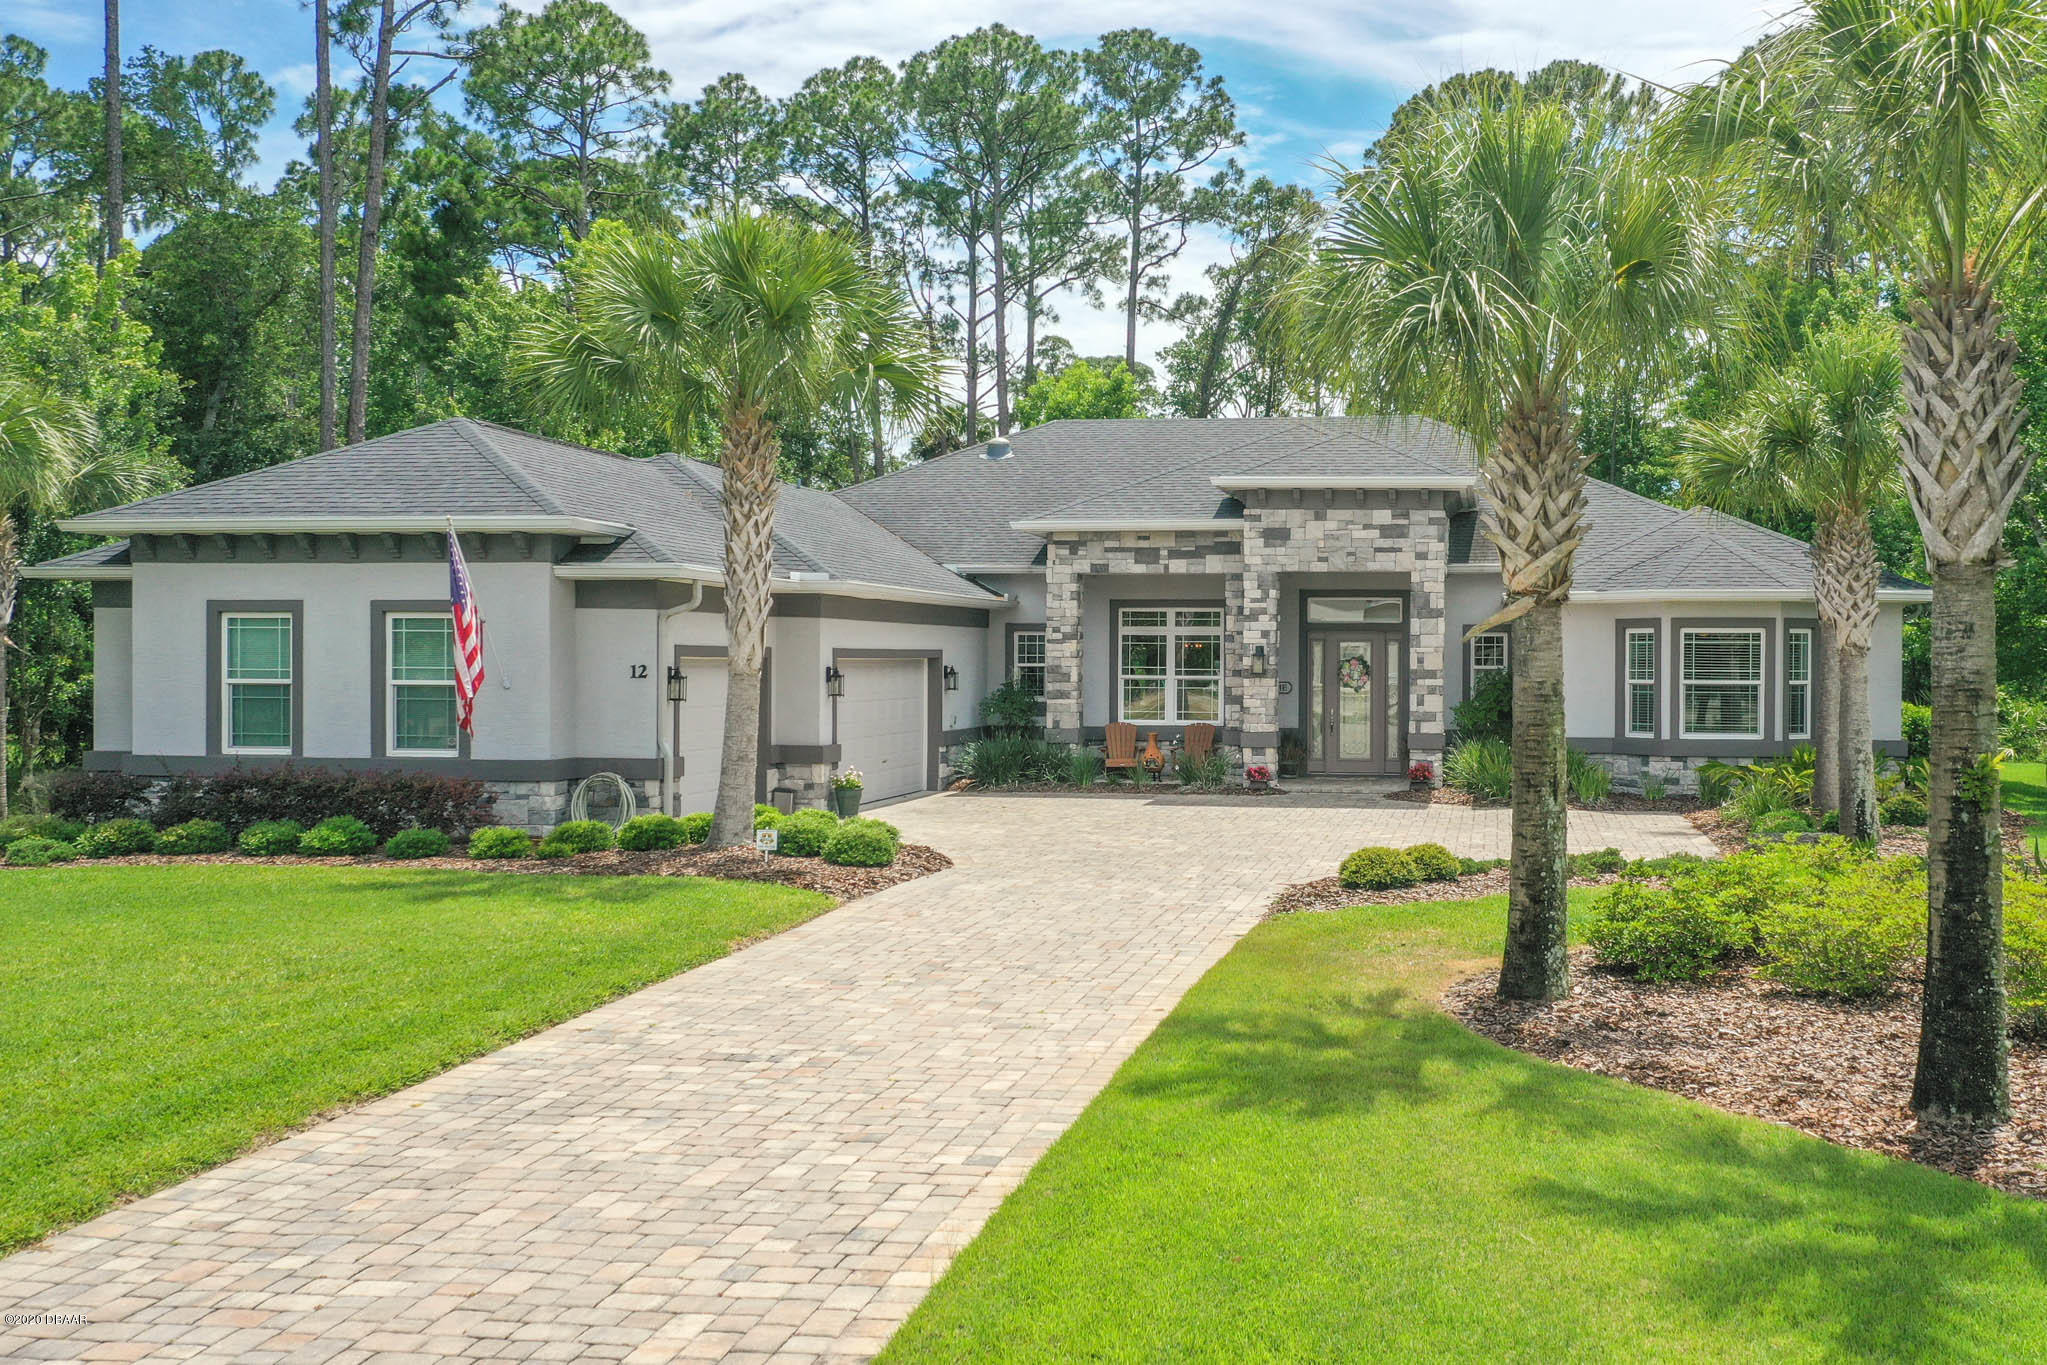 Photo of 12 Scarlet Oak Circle, Palm Coast, FL 32137